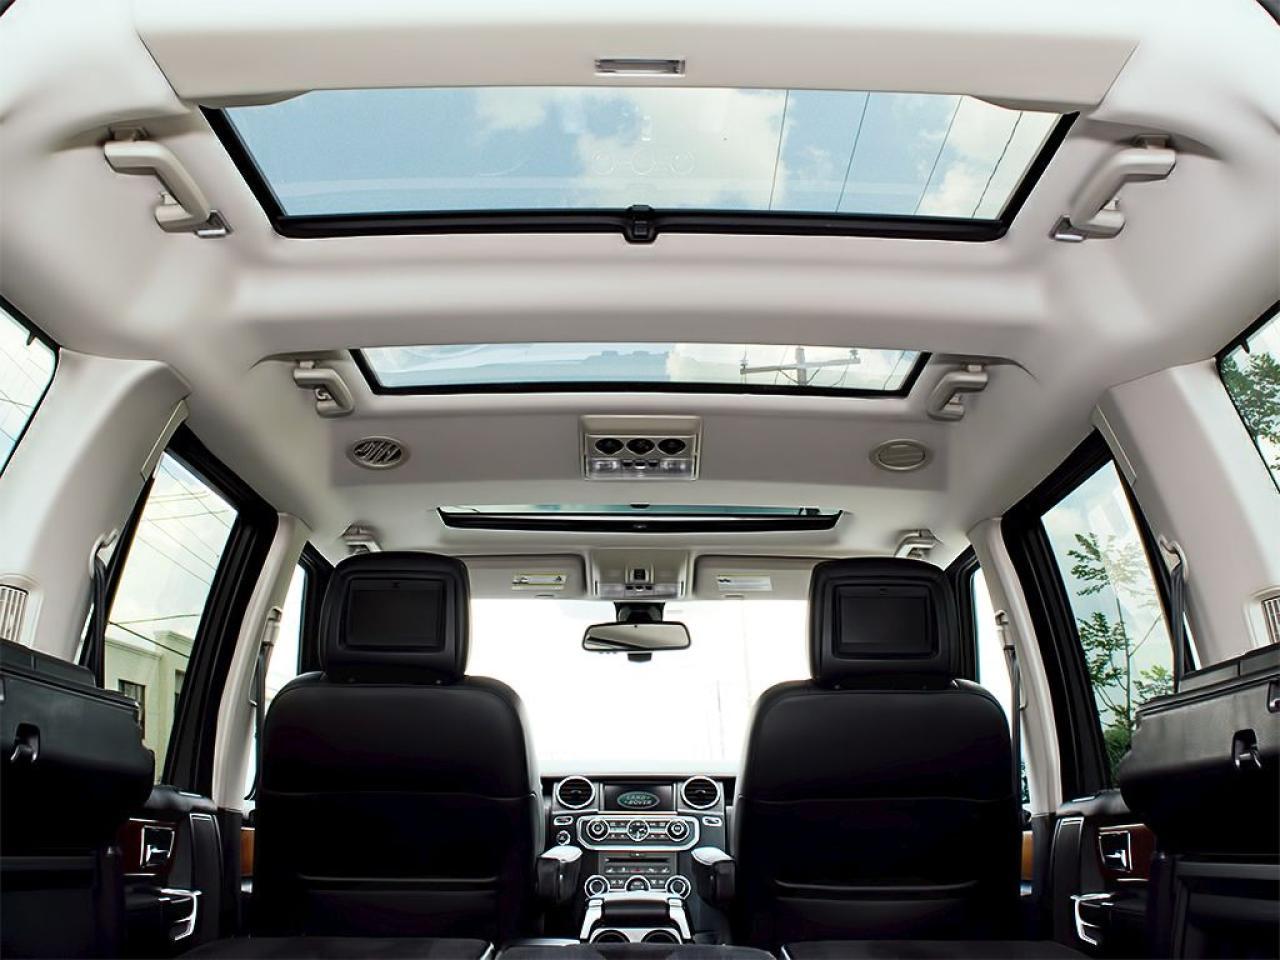 2011 Land Rover LR4 HSE|LUX|NAVI|360 CAMERA|DUAL DVD|RUNNING BOARD